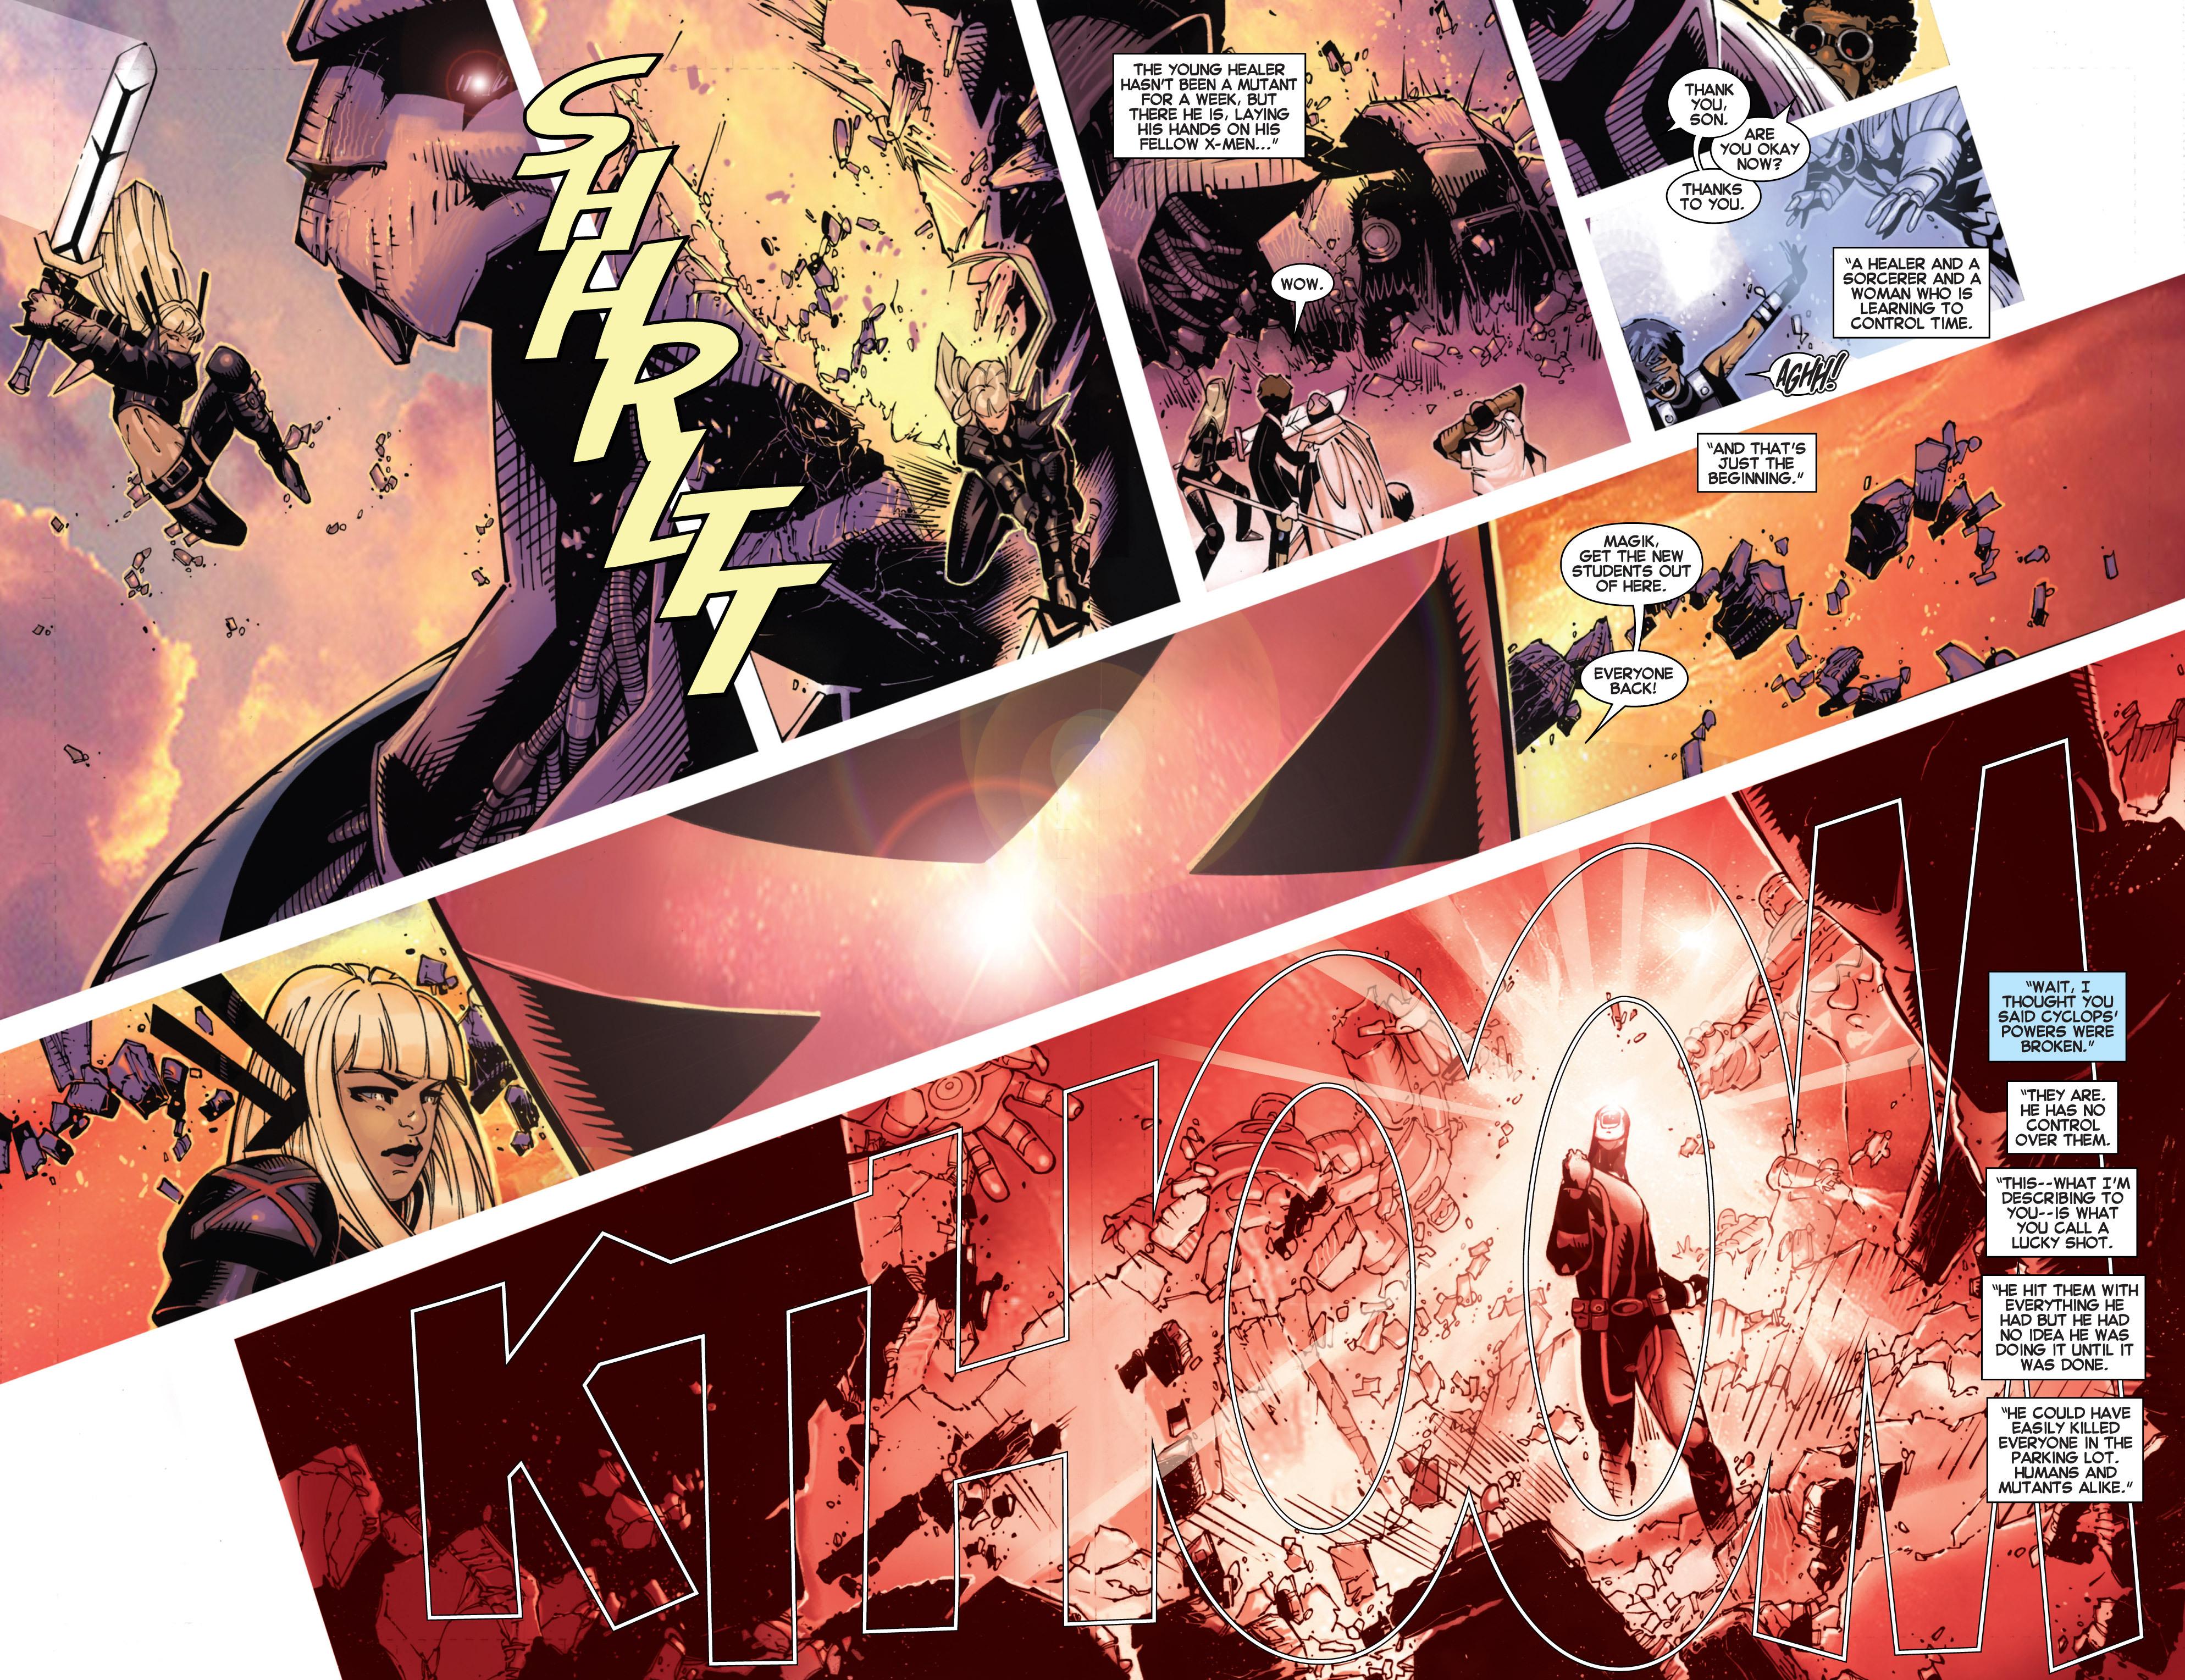 Read online Uncanny X-Men (2013) comic -  Issue # _TPB 1 - Revolution - 18